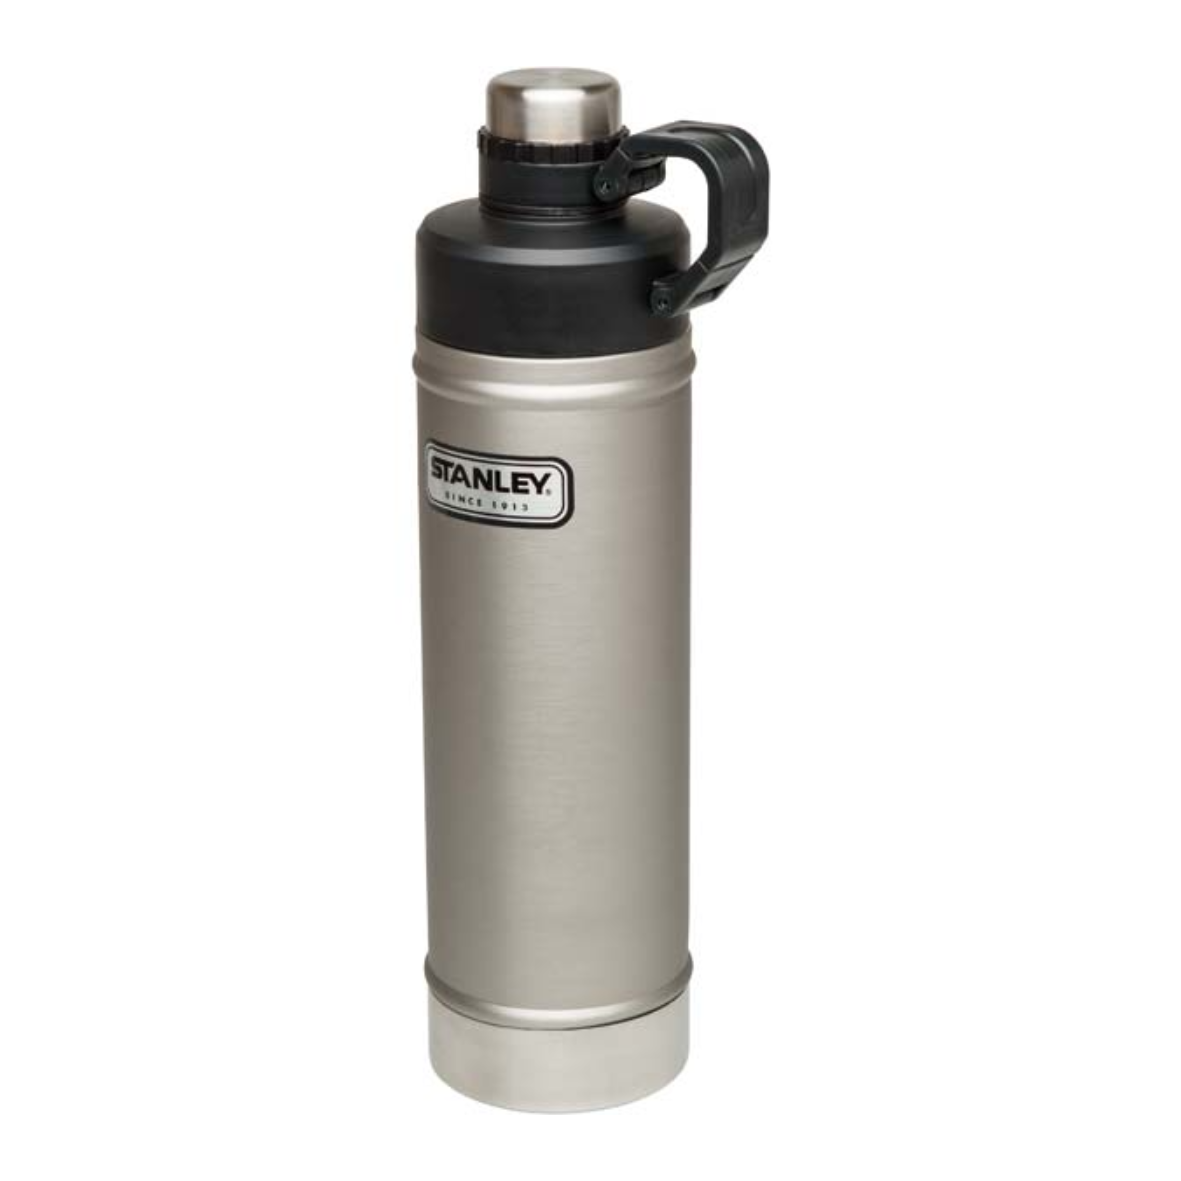 Stanley Classic Vacuum Water Bottle 0,75l